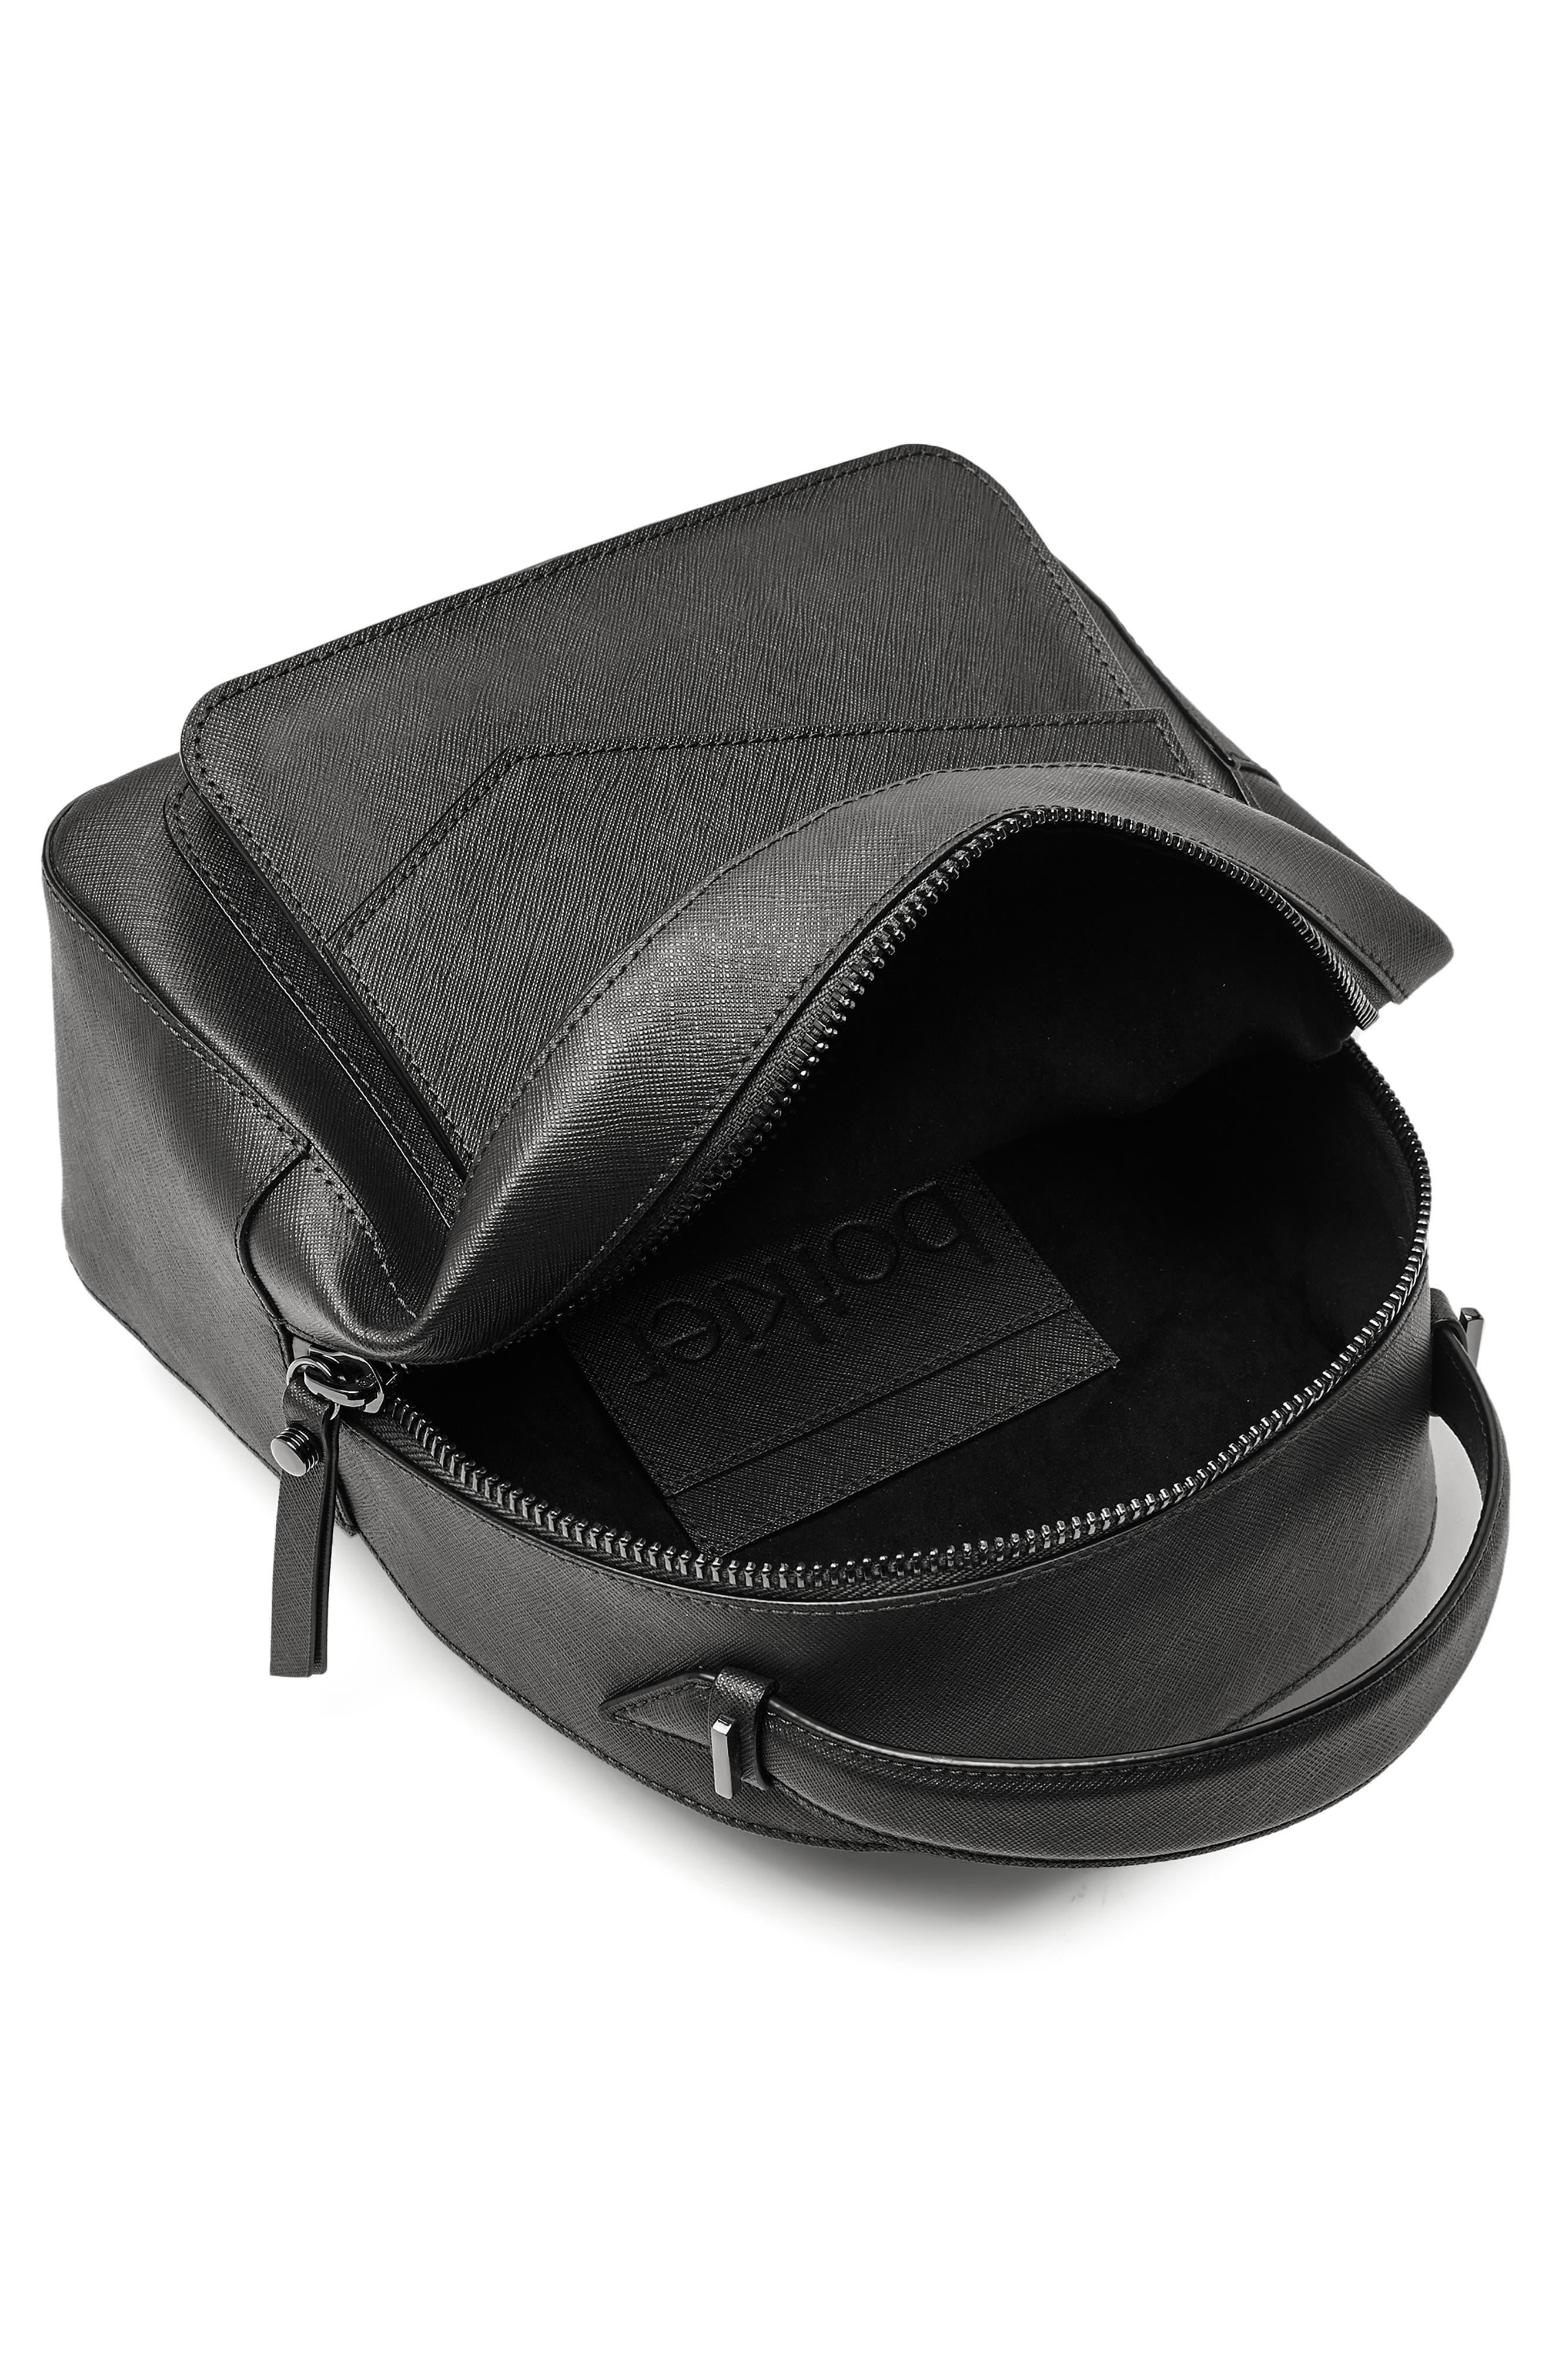 Cobble Hill Calfskin Leather Backpack,                             Alternate thumbnail 3, color,                             BLACK